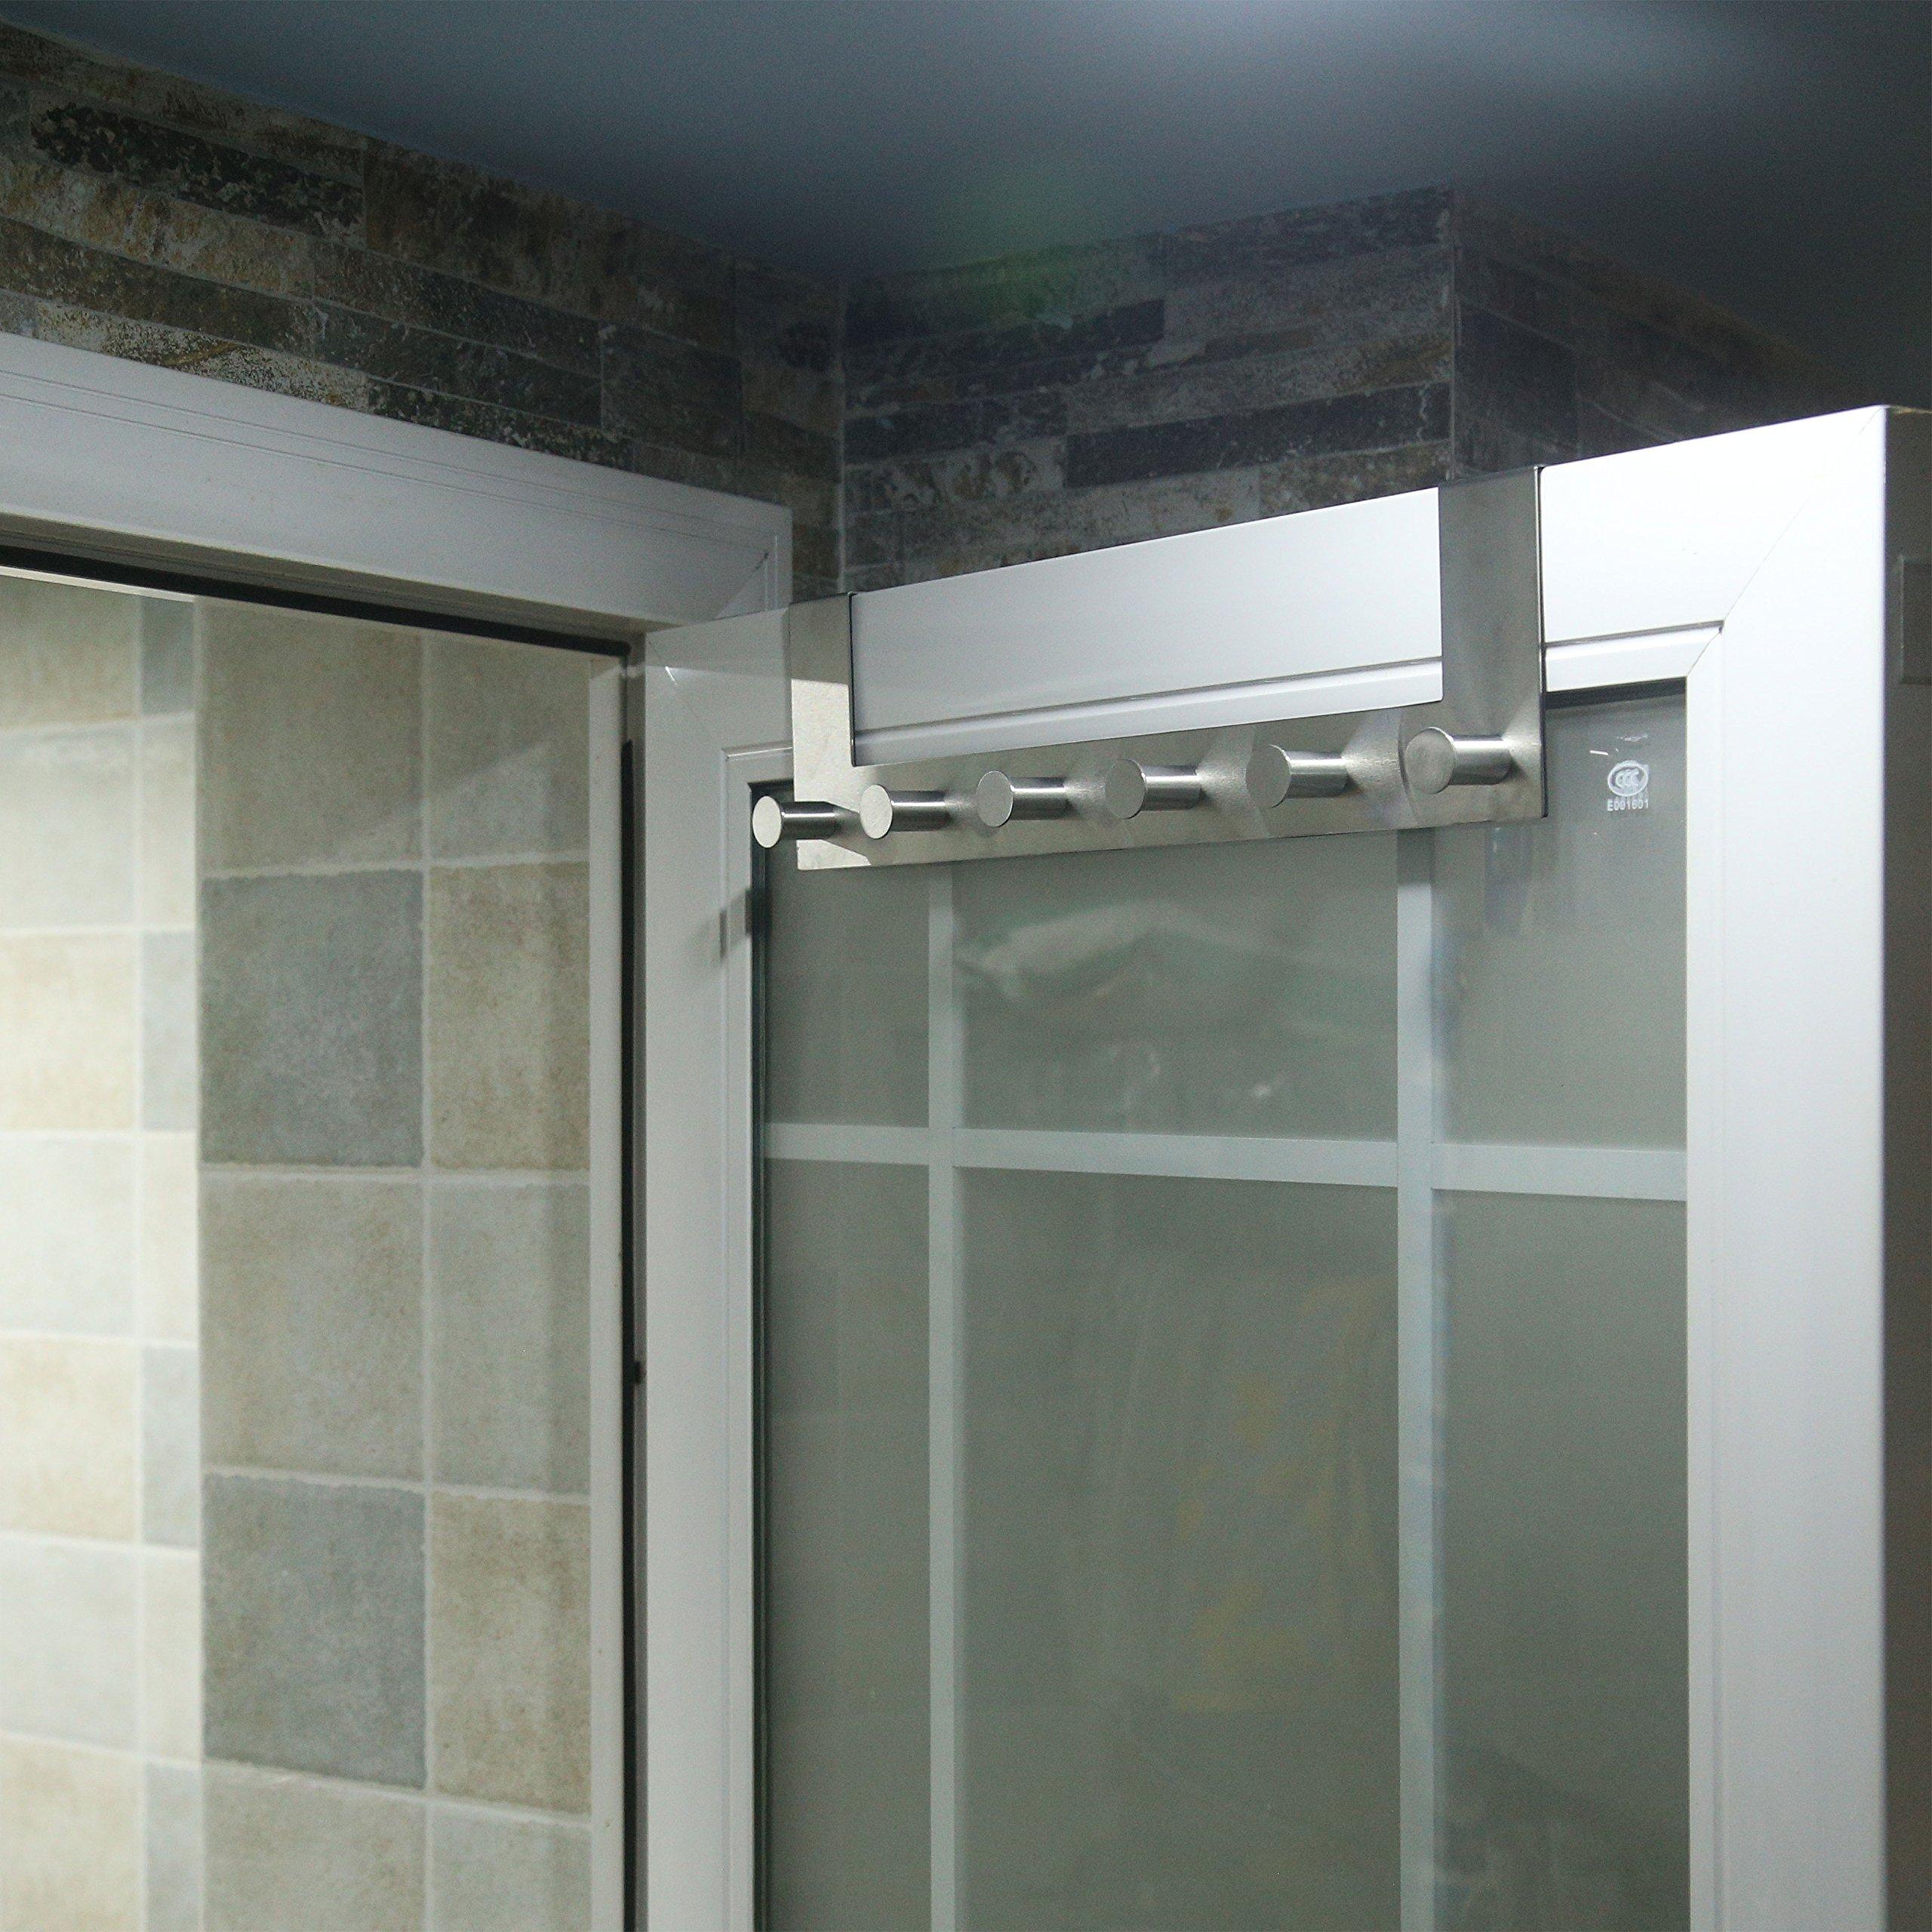 WEBI Over-The-Door Hooks : Modern, Heavy Duty, Anti-Rust, Clou Door Hanger,6 Coat Hook Pegs, Towel Holder, Utility for Coats, Towel, Hats, Bags, Scarves, Purse (6 Pegs, Stainless Steel,Satin,2 Packs) by WEBI (Image #7)